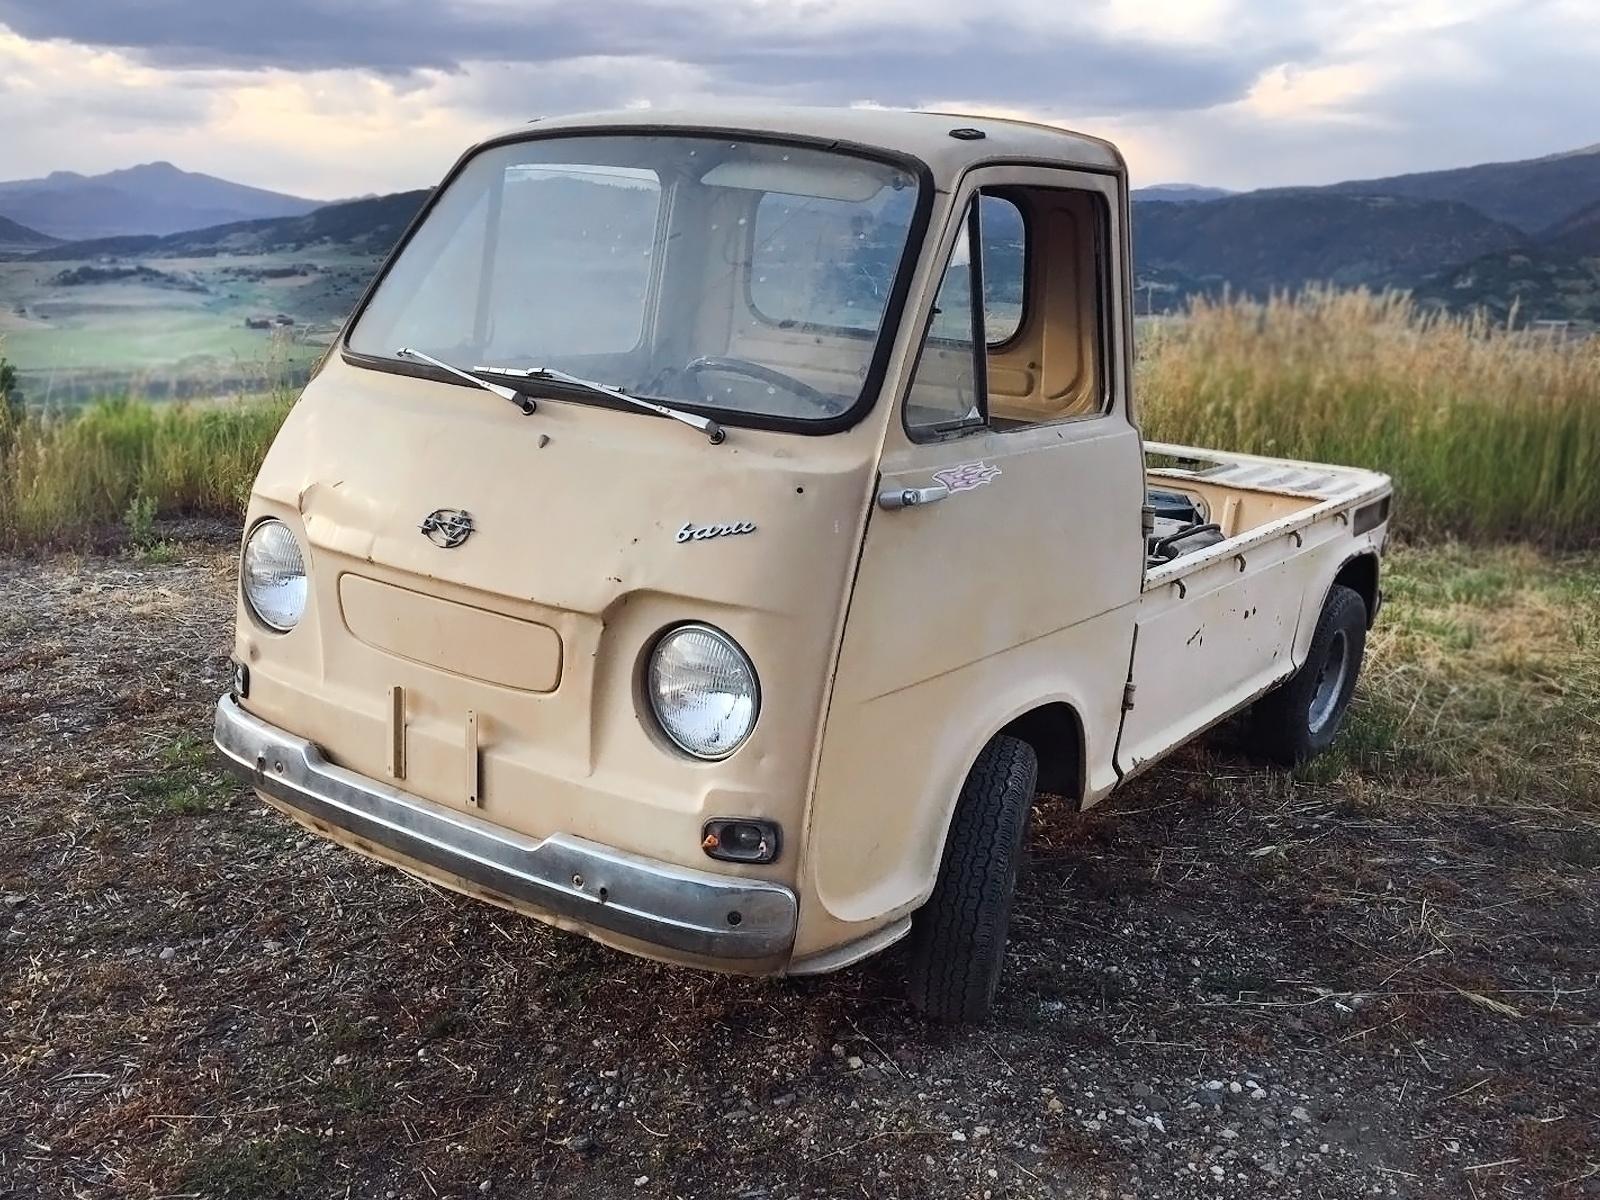 Subaru Colorado Springs >> Rare Truck: 1969 Subaru 360 Sambar Pickup